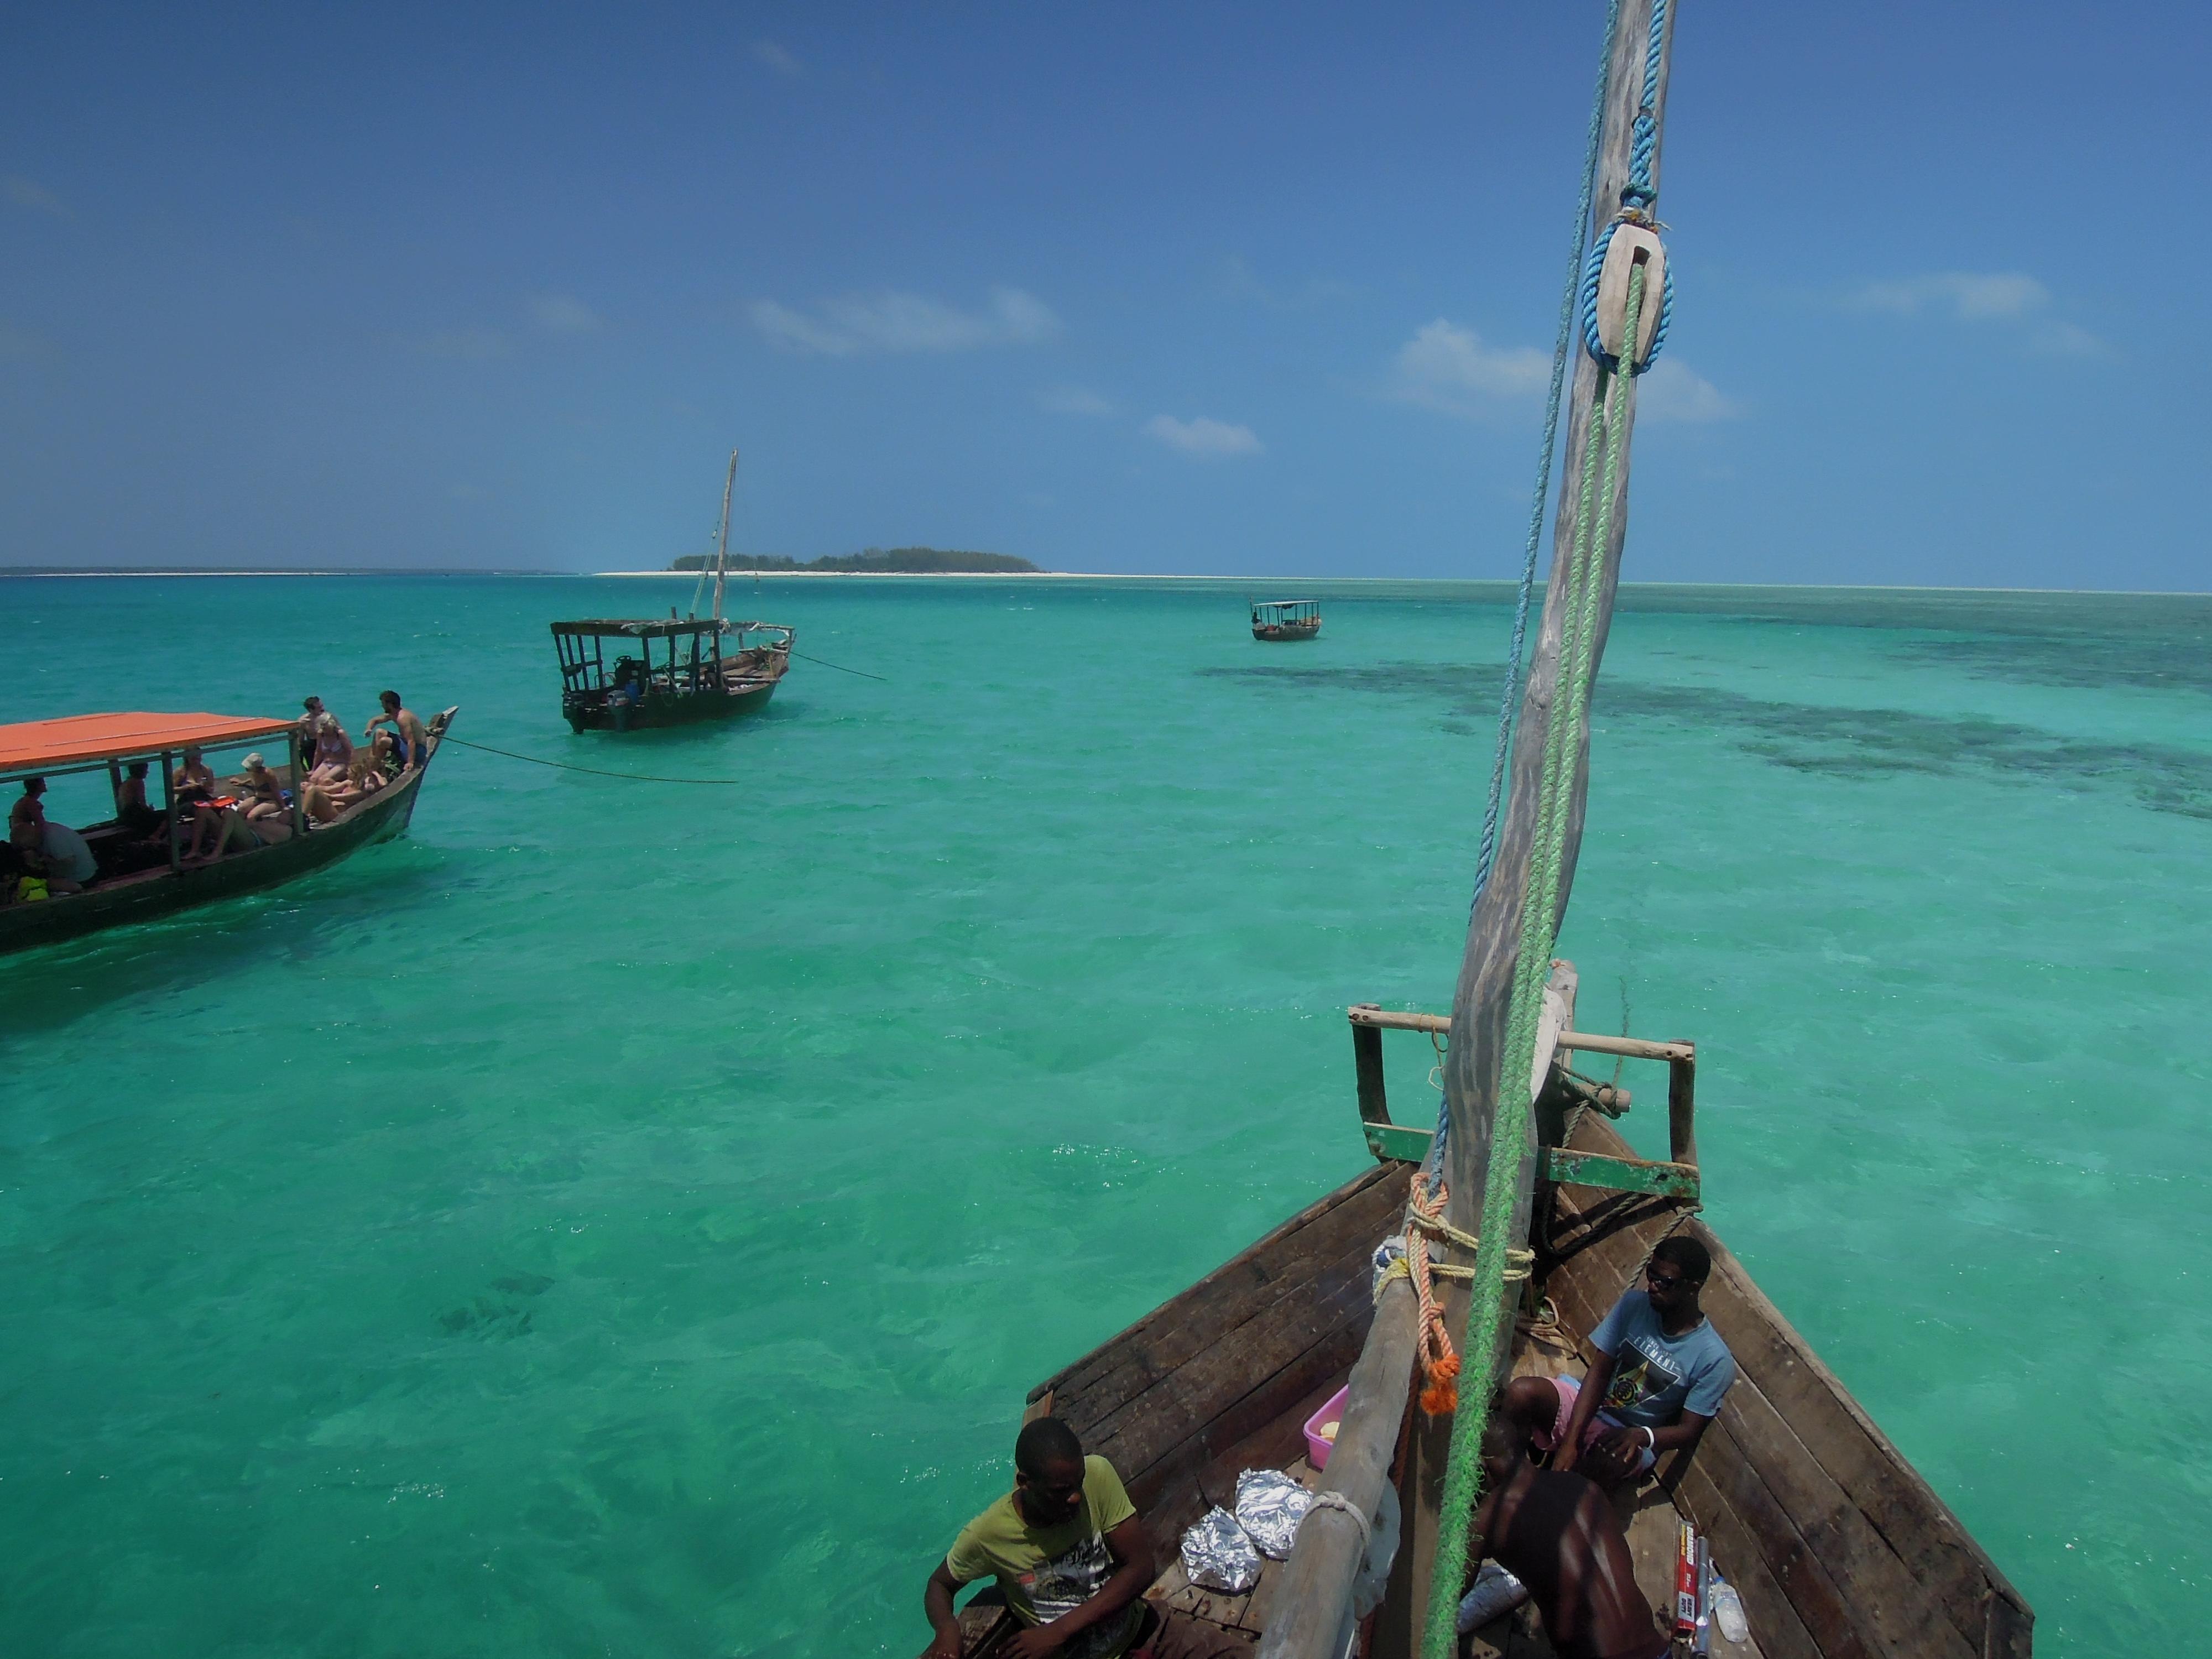 Mnemba Island Marine Conservation, Tanzania, fot. A. Mielczarek